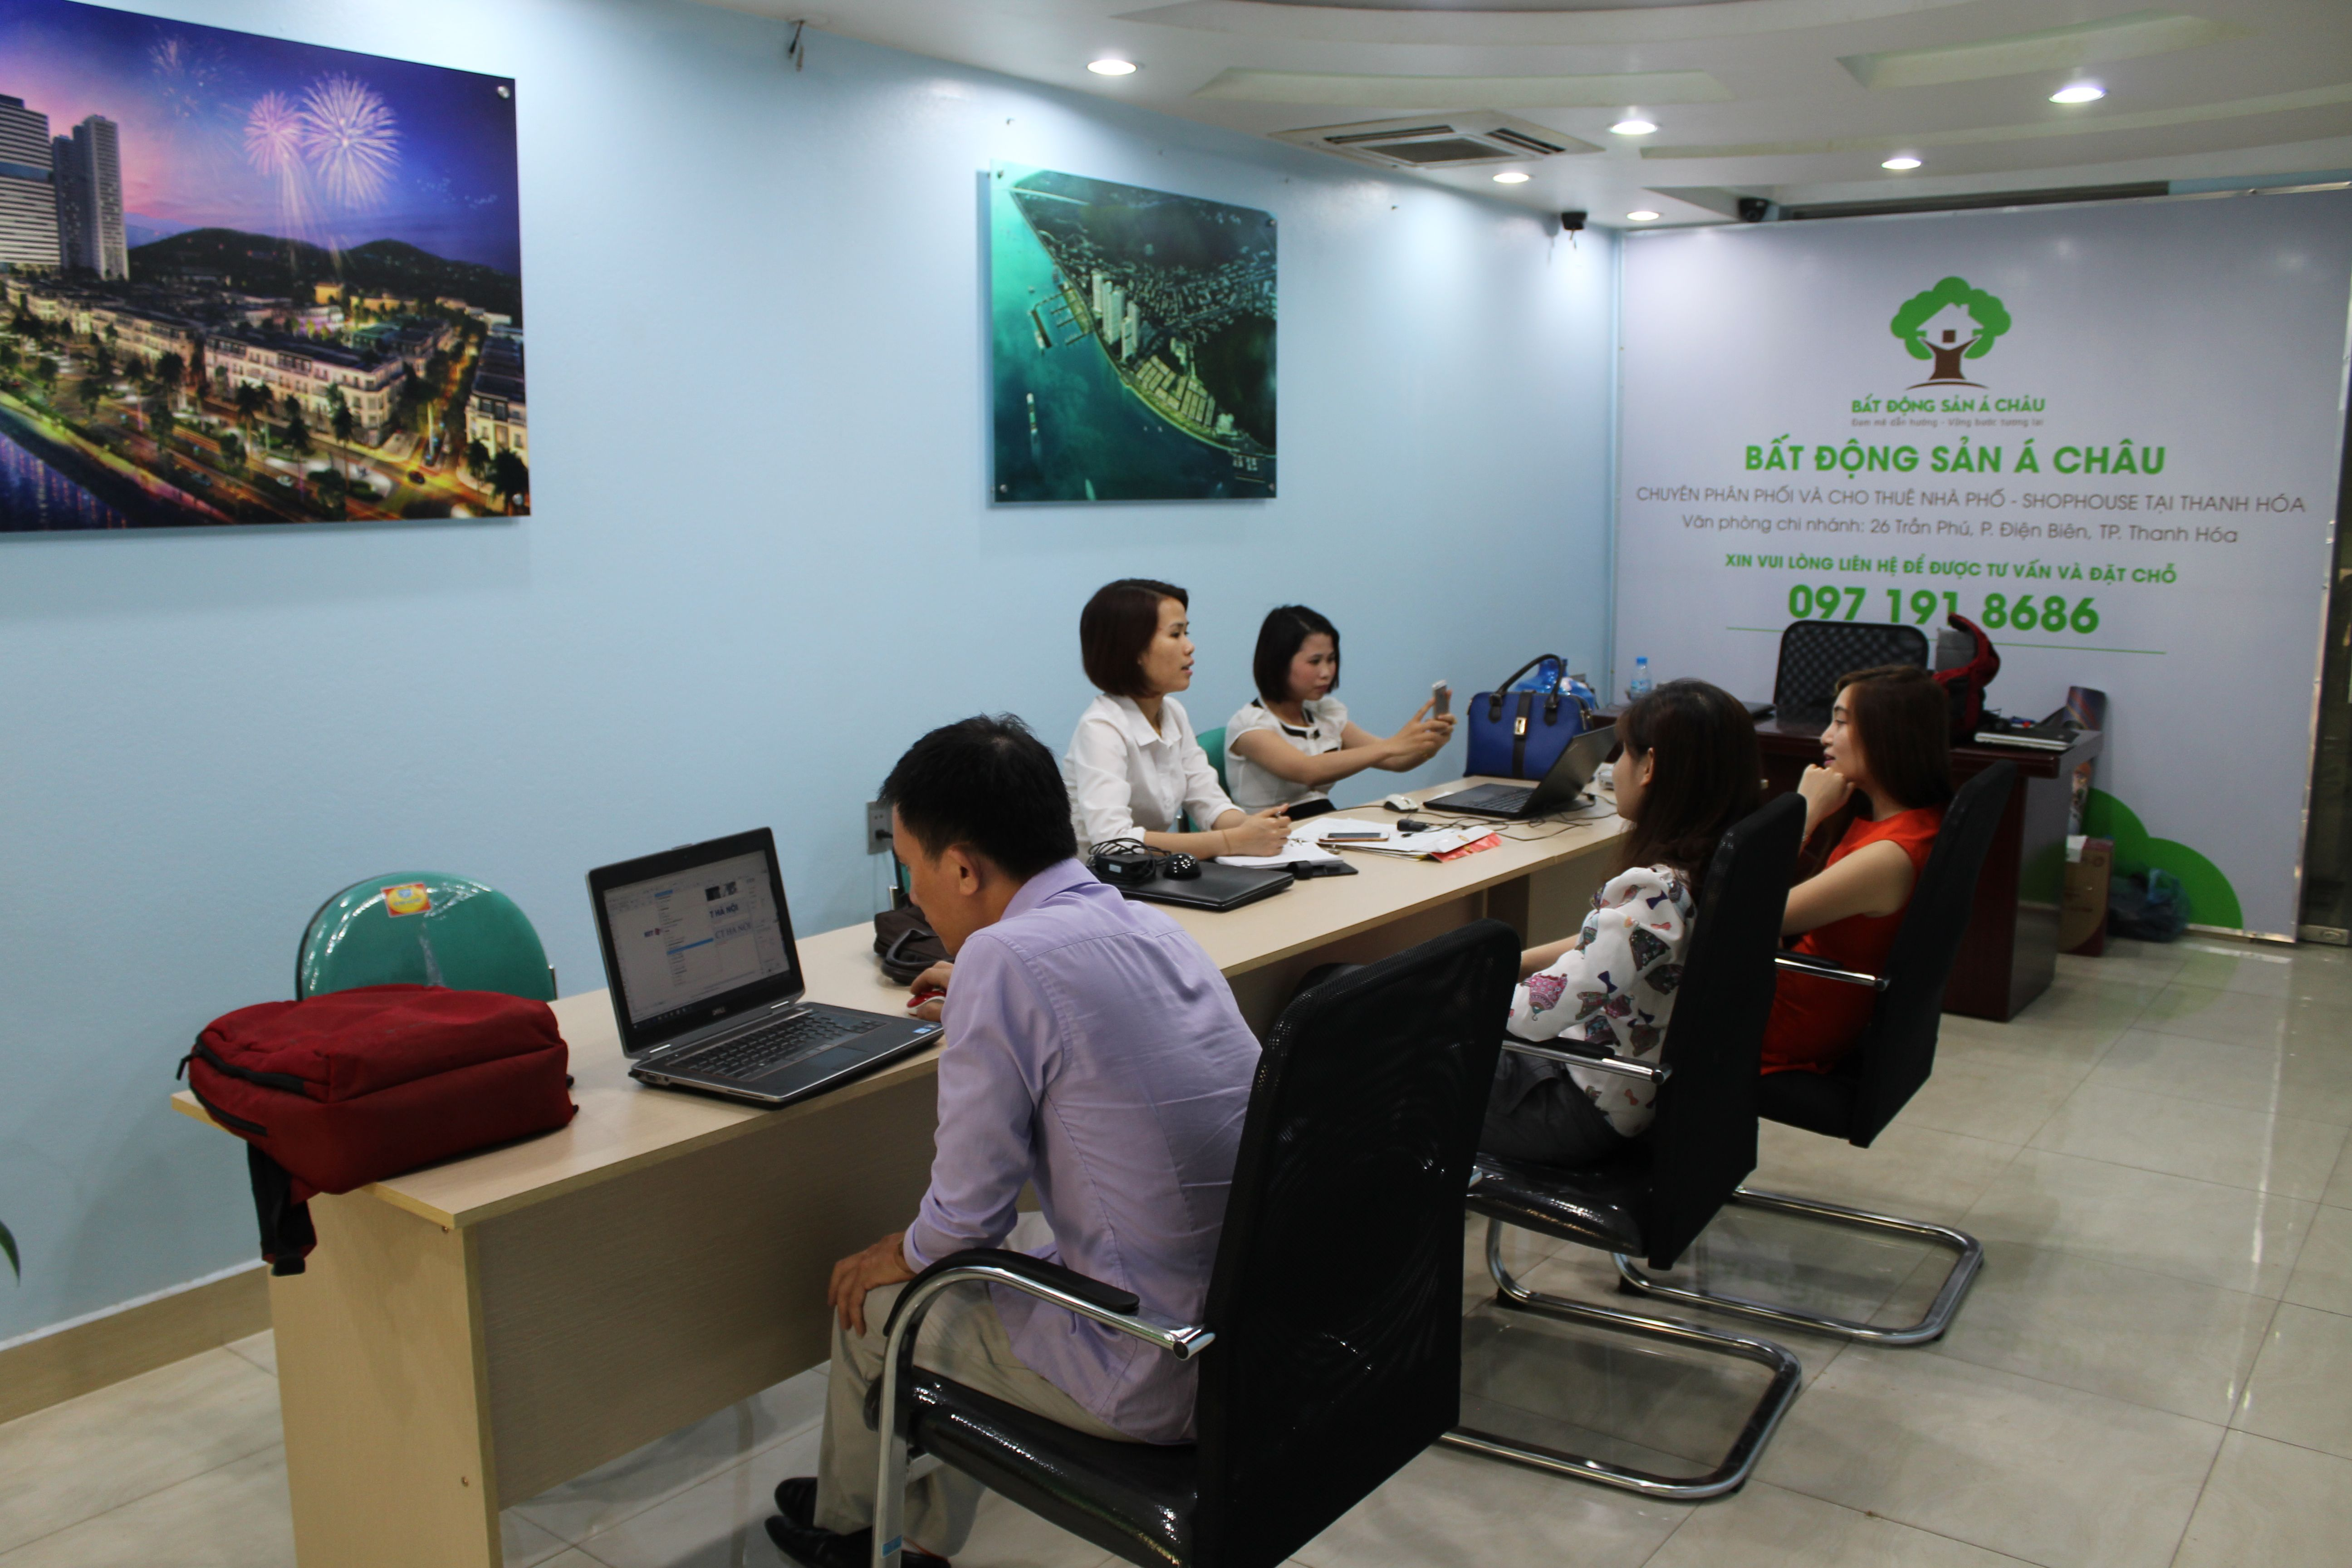 hoa office. Offices, City, Bureaus, Desks, The Office, Corporate Offices Hoa Office